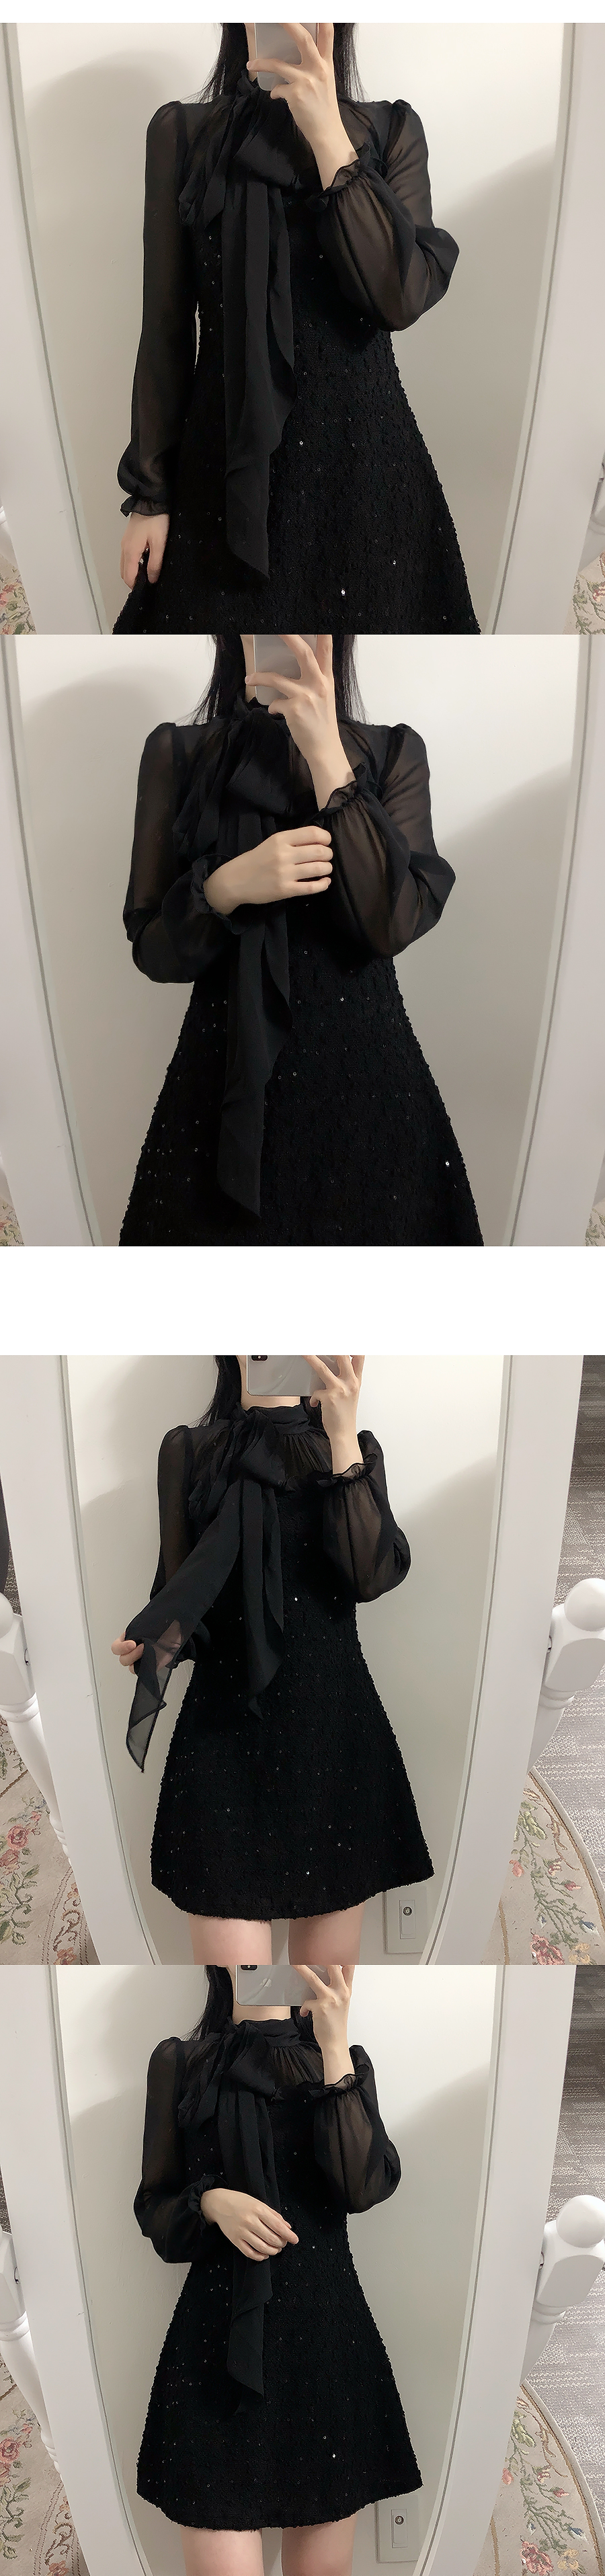 Sequin tie color matching dress 2color